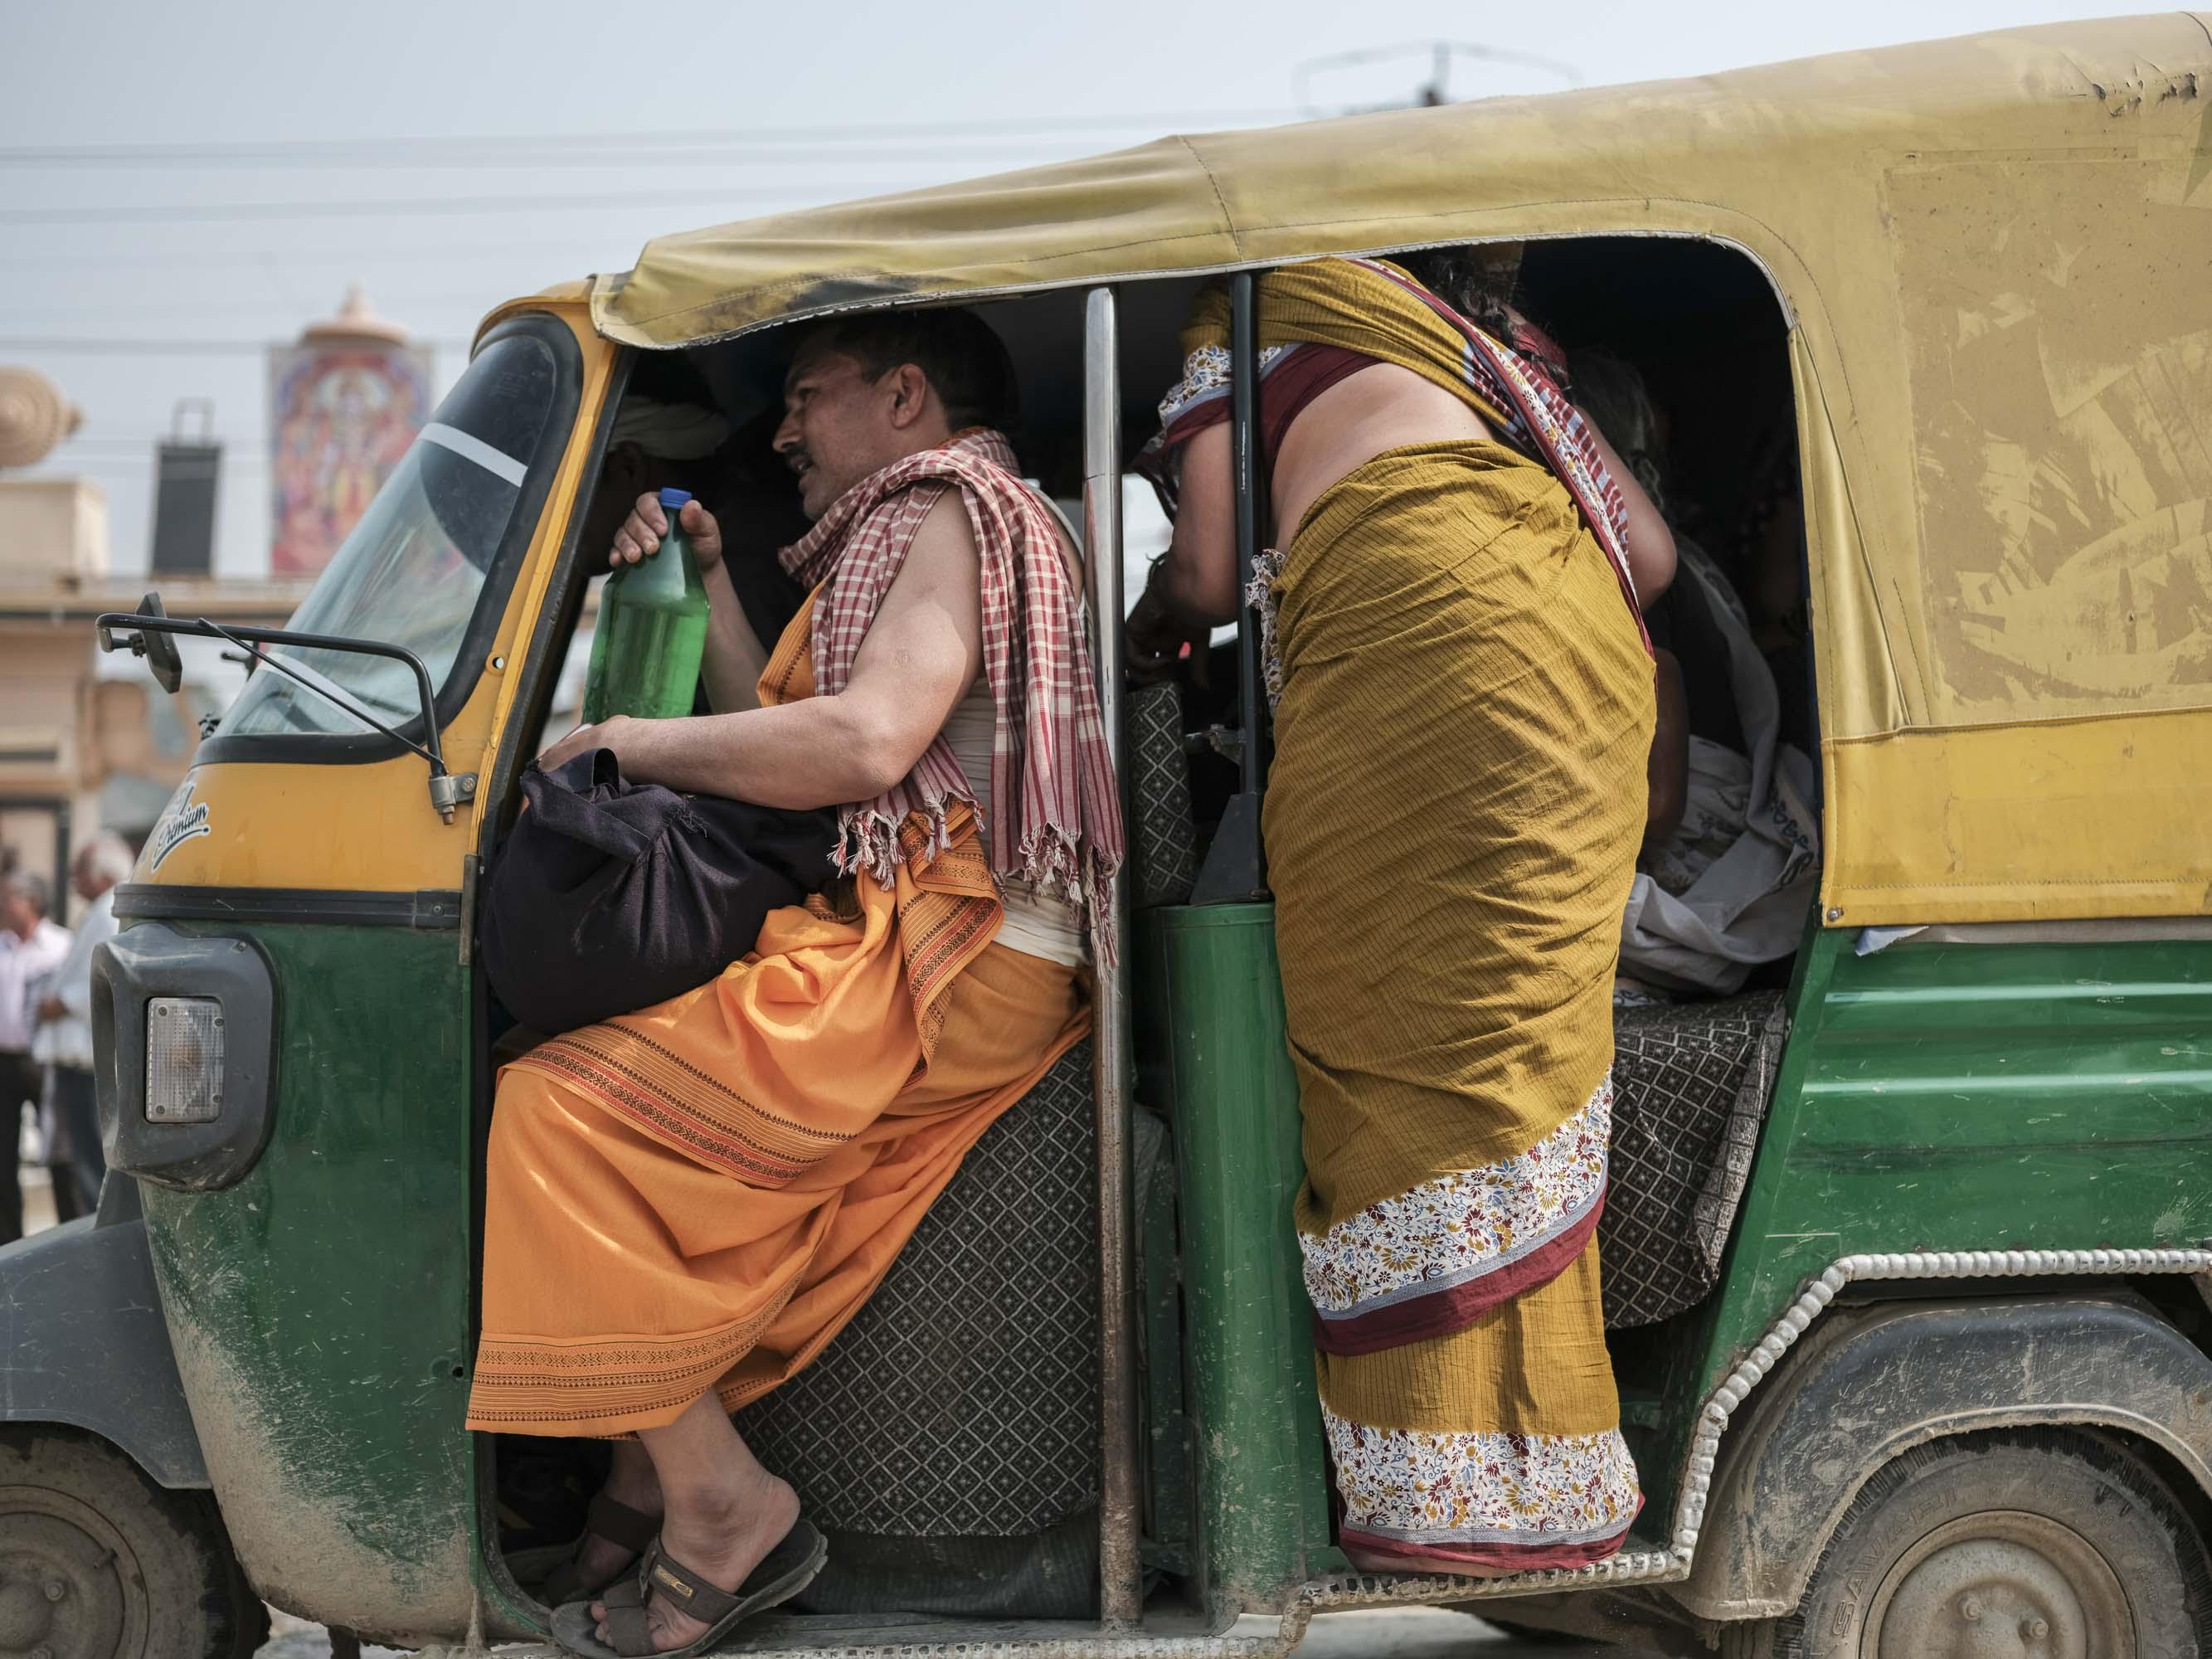 tuk tuk taxis pilgrims Kumbh mela 2019 India Allahabad Prayagraj Ardh hindu religious Festival event rivers photographer jose jeuland photography